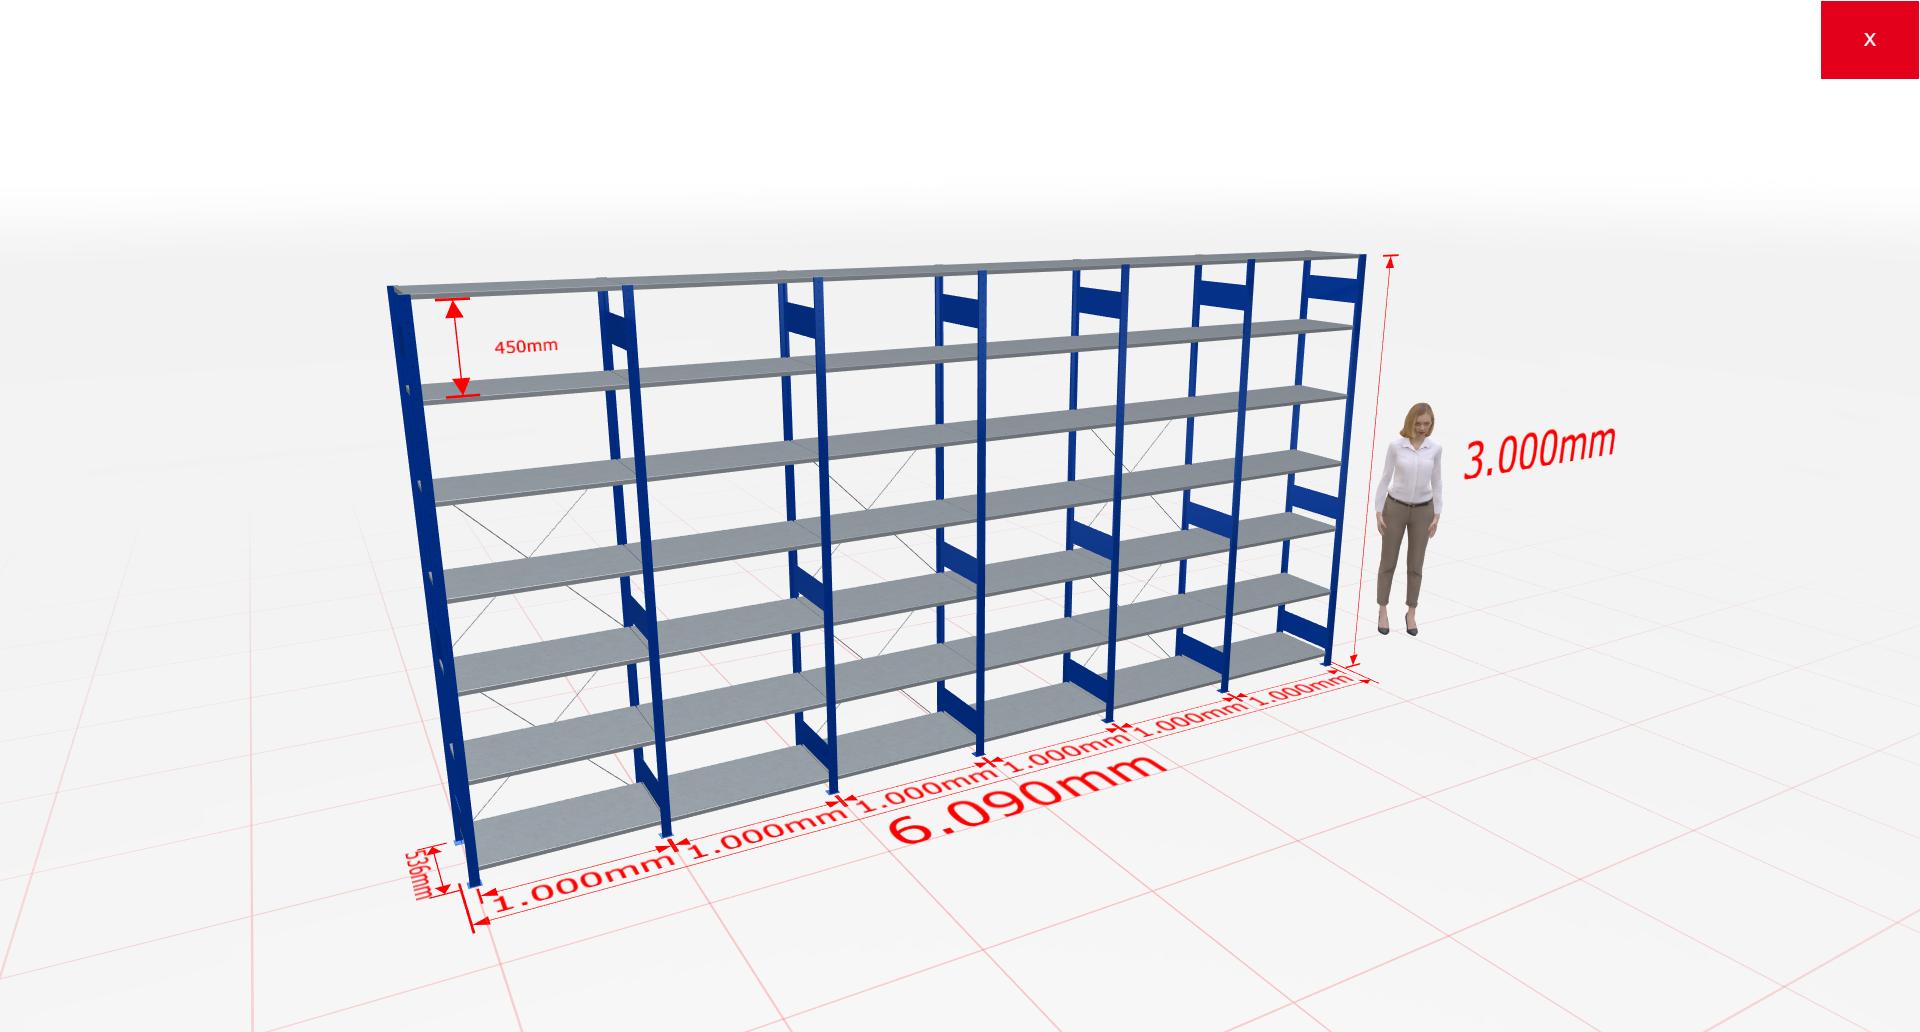 Fachbodenregal Komplettregal 3000x6090x500 mm (HxBxT) SCHULTE Lagertechnik blau 7 Ebenen  150 kg je Boden